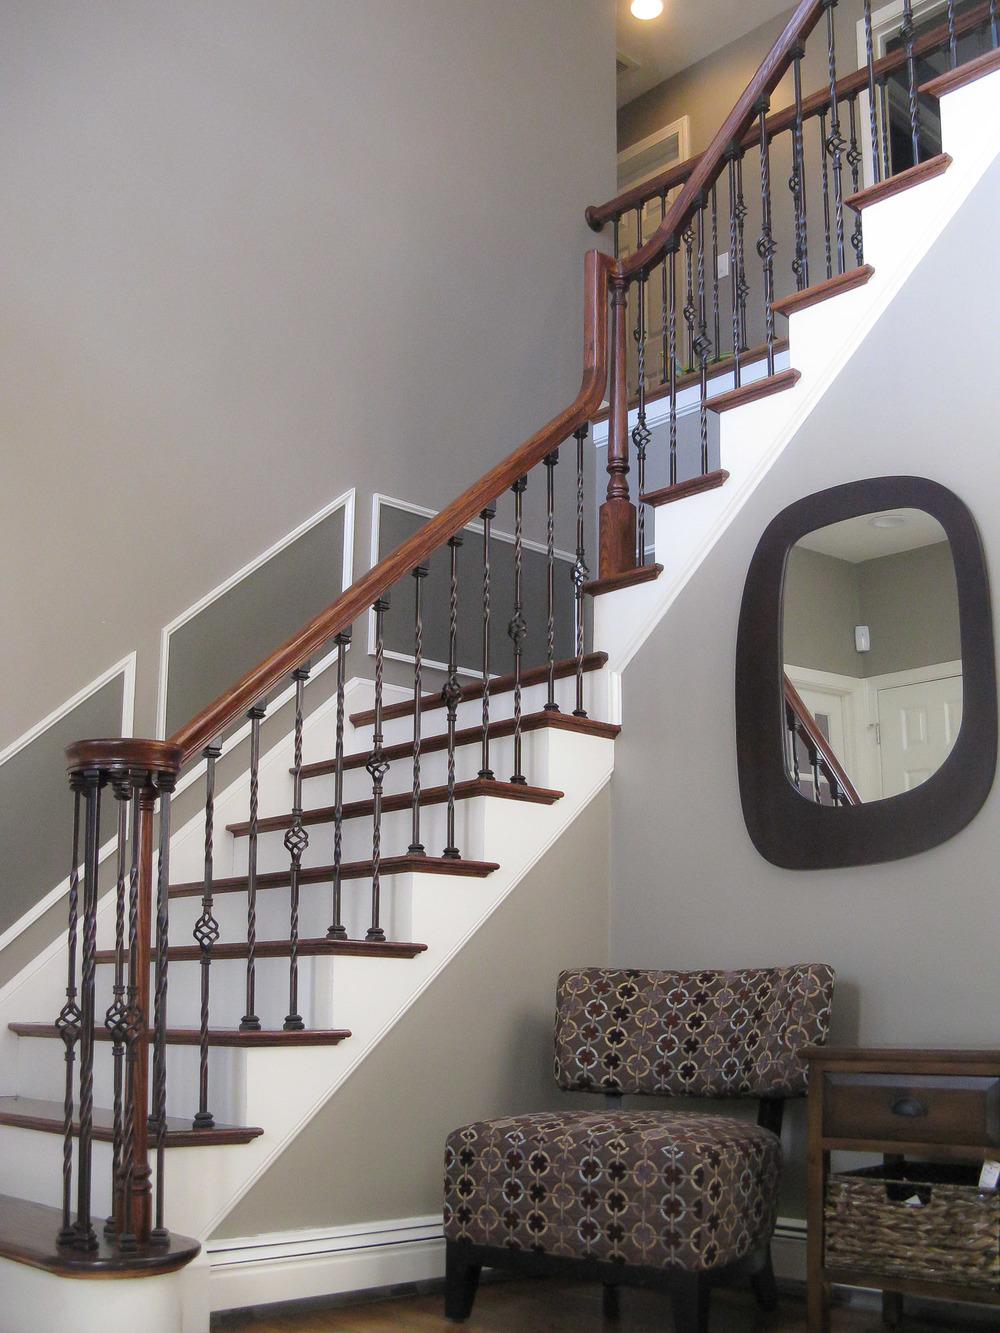 big-dog-painting-interiors-winchester.jpg